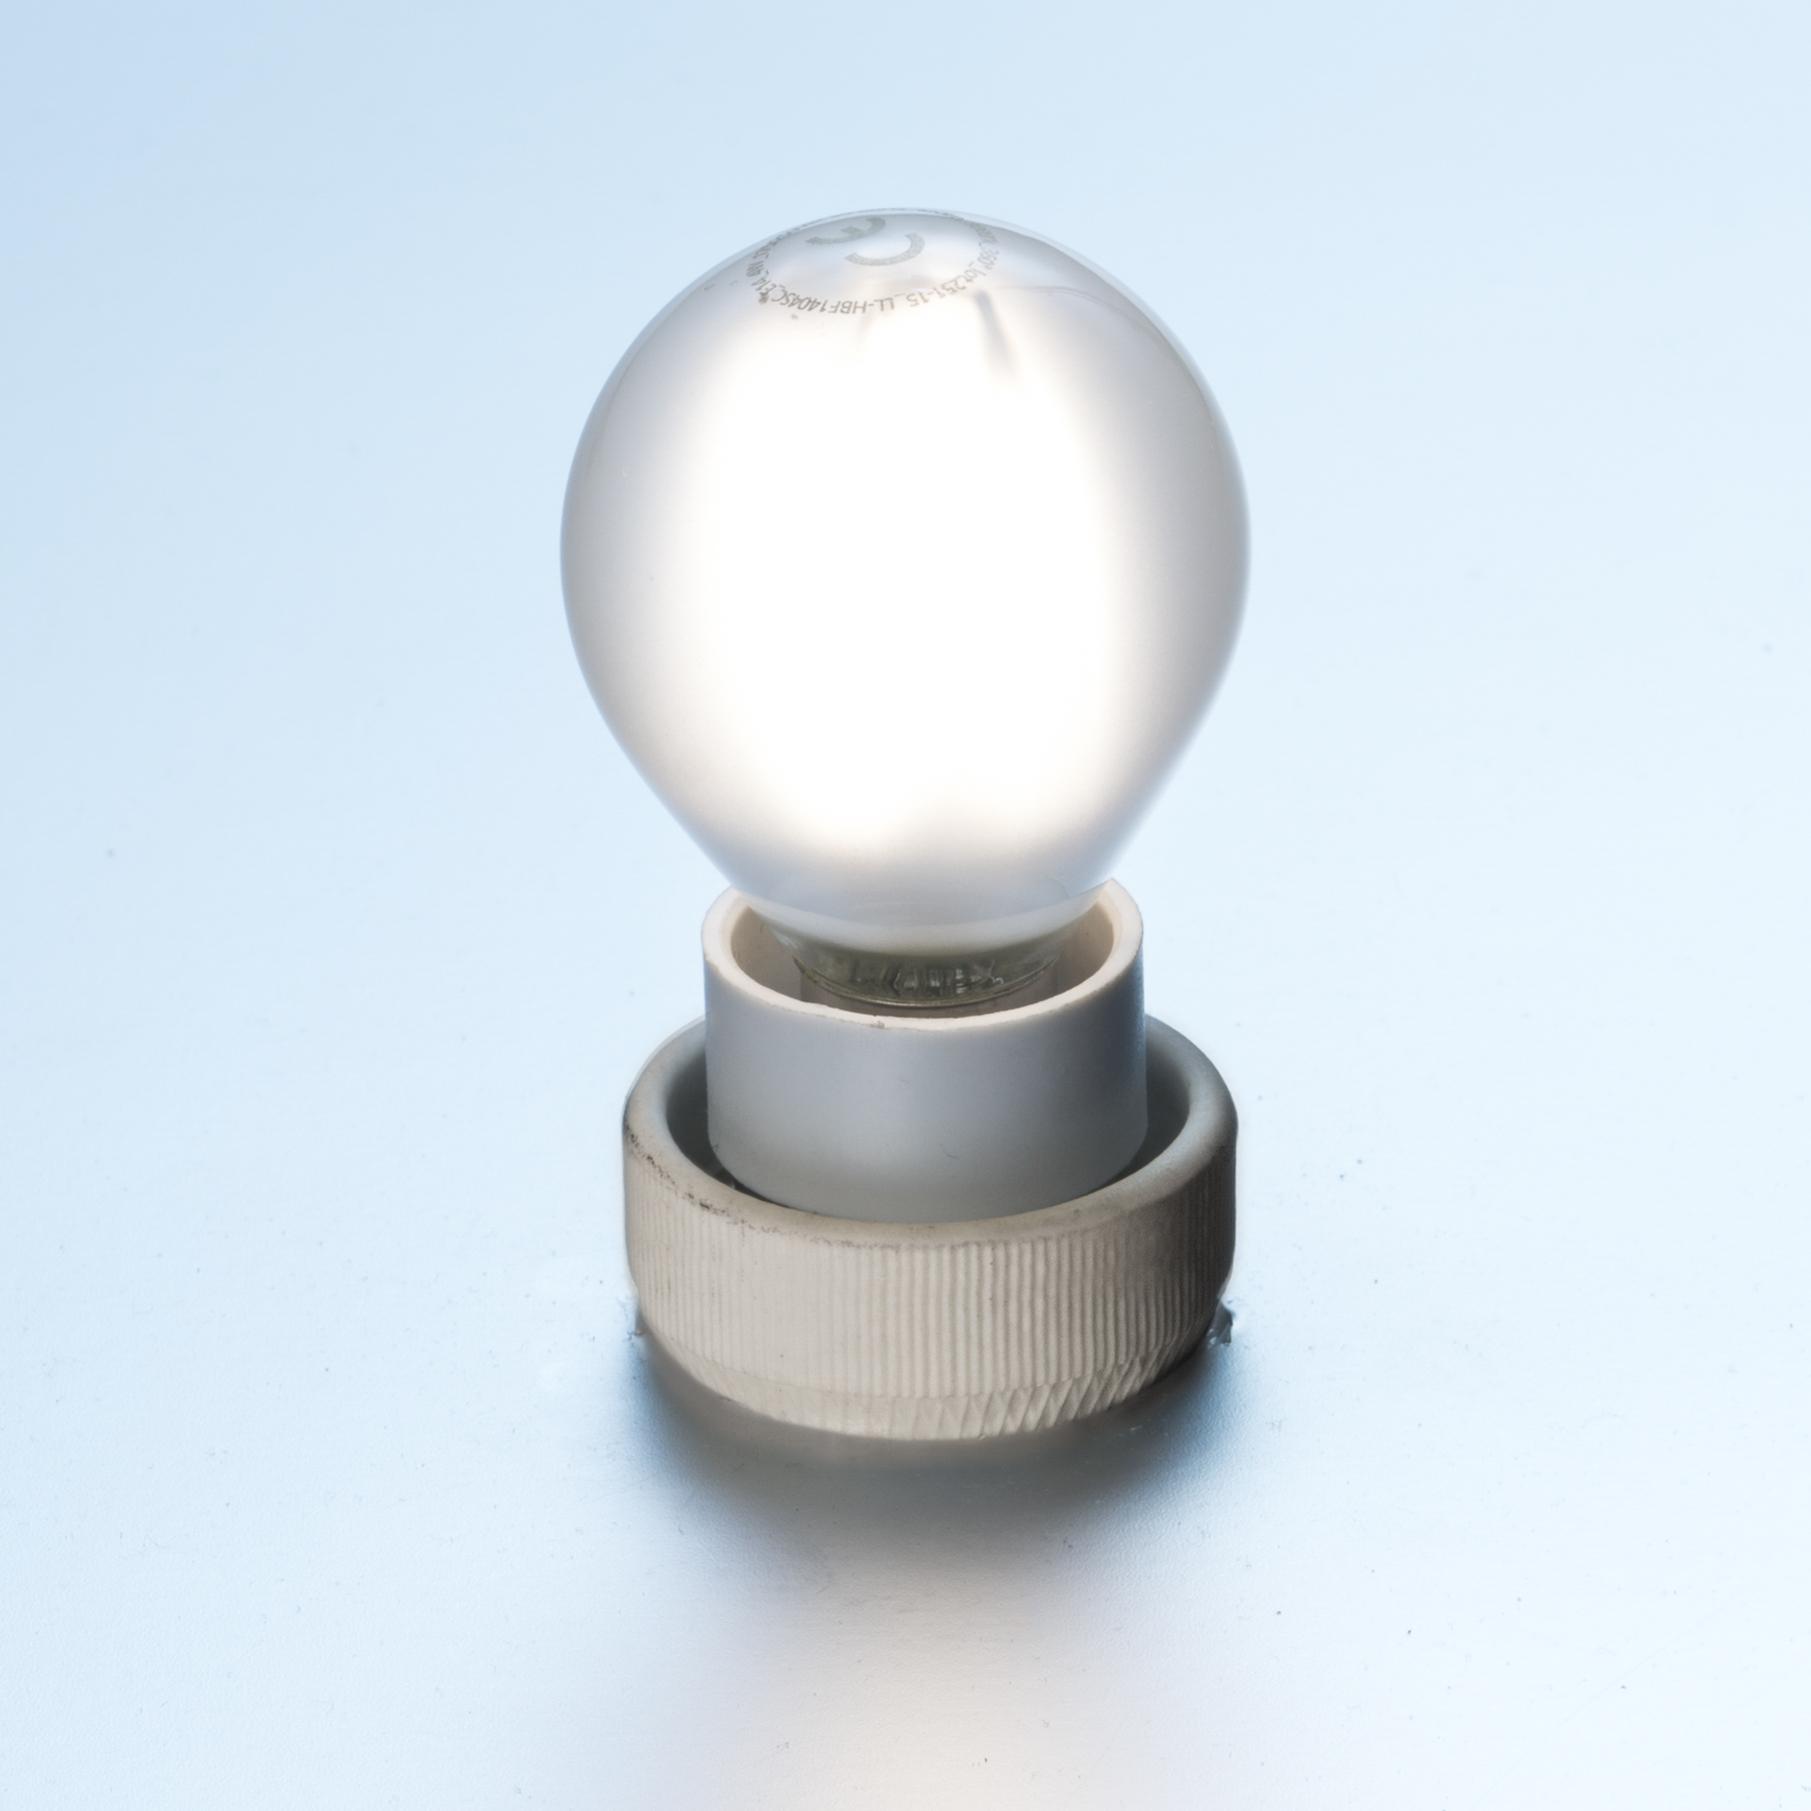 led gl hlampe fadenlampe tropfen 4 w matt e14 420 lumen kaltwei led filament dimmbar. Black Bedroom Furniture Sets. Home Design Ideas